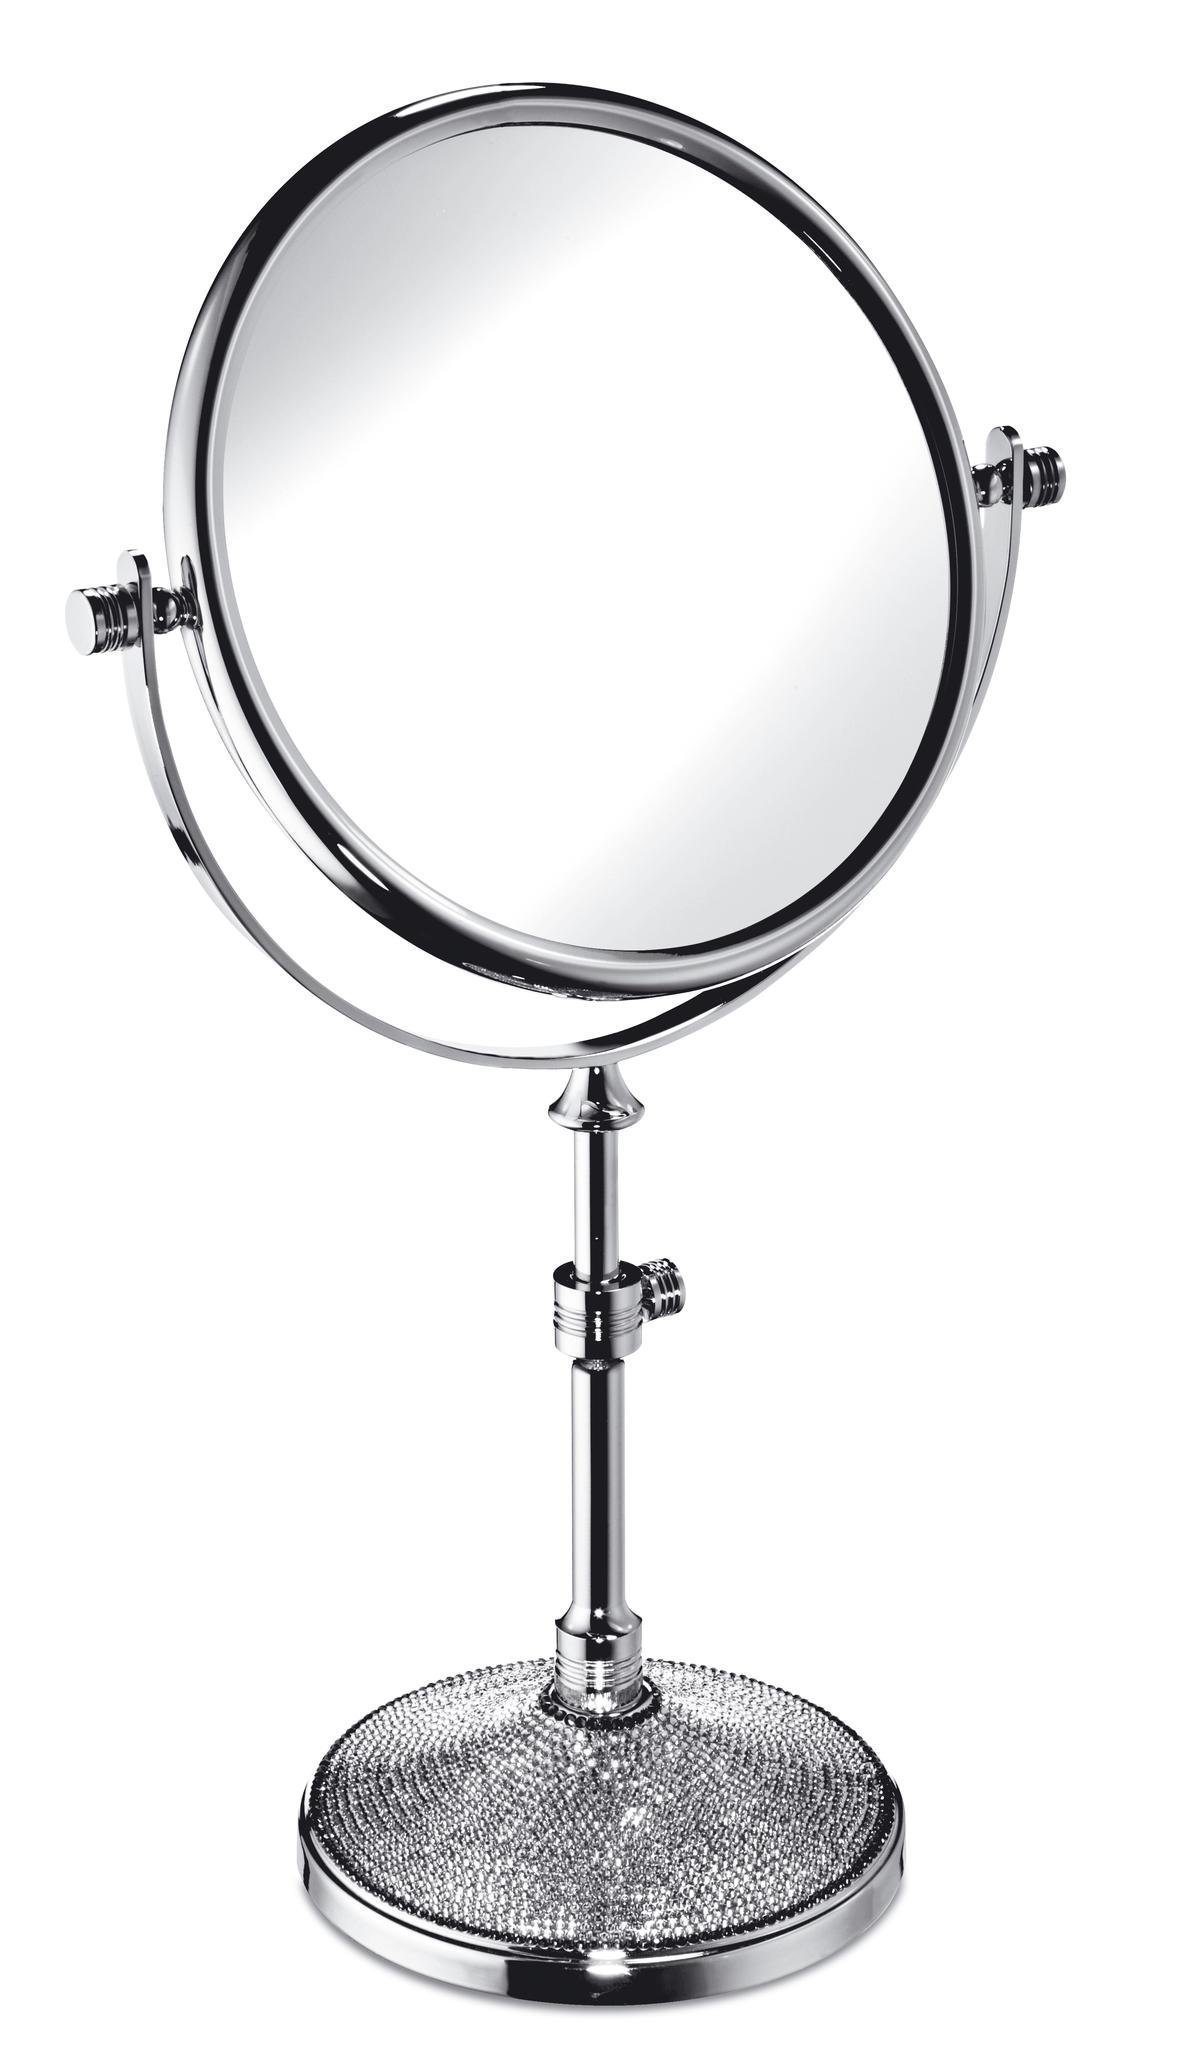 Зеркала Зеркало косметическое Windisch 99532CR 3X Starlight elitnoe-zerkalo-kosmeticheskoe-99532-starlight-ot-windisch-ispaniya-chrom.jpg